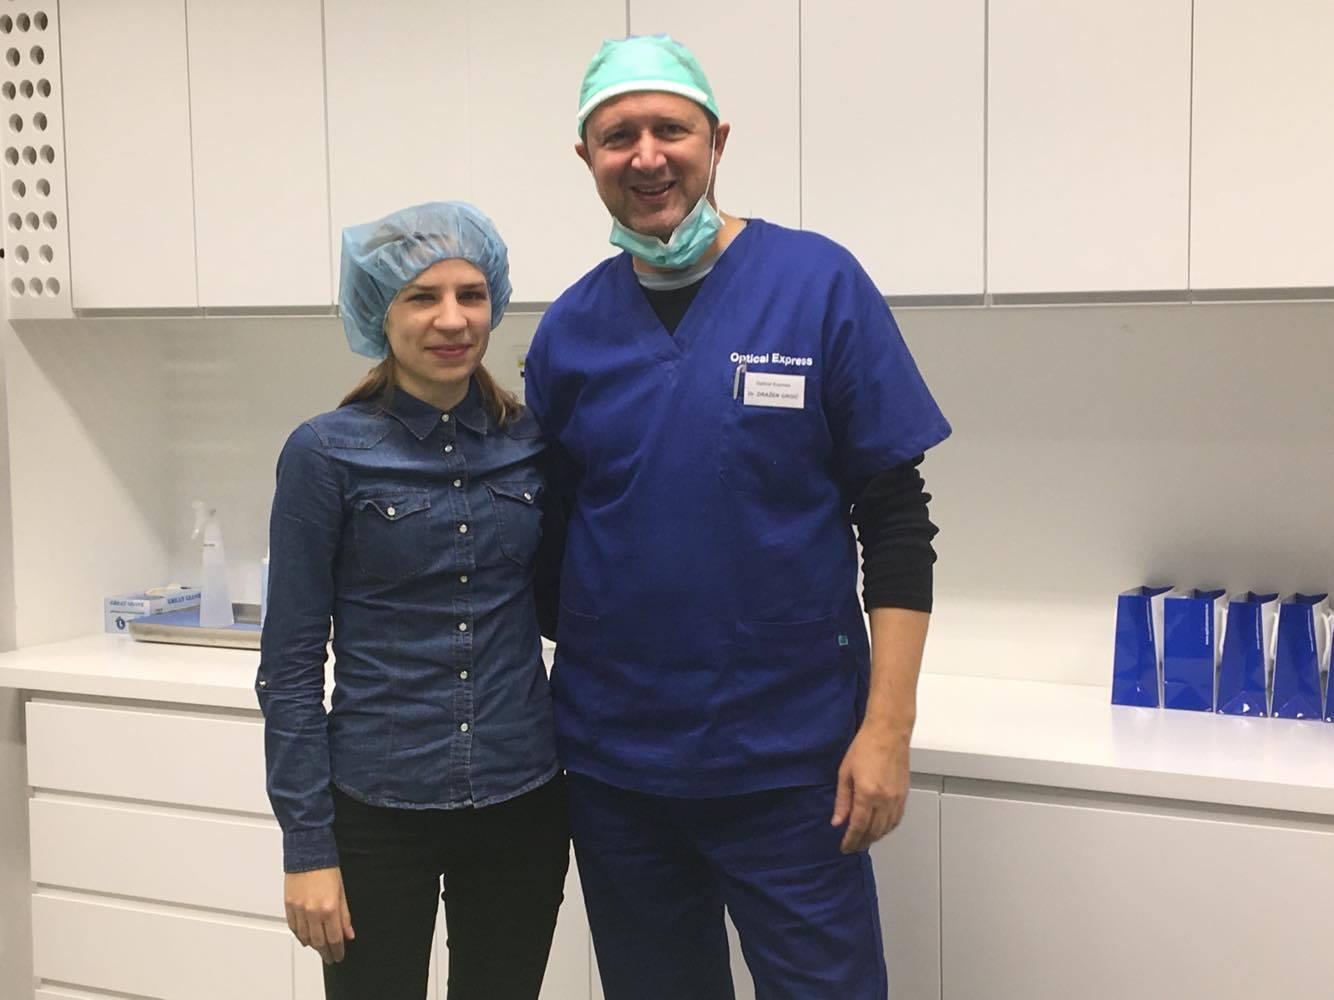 optical express doktor grgic operacija